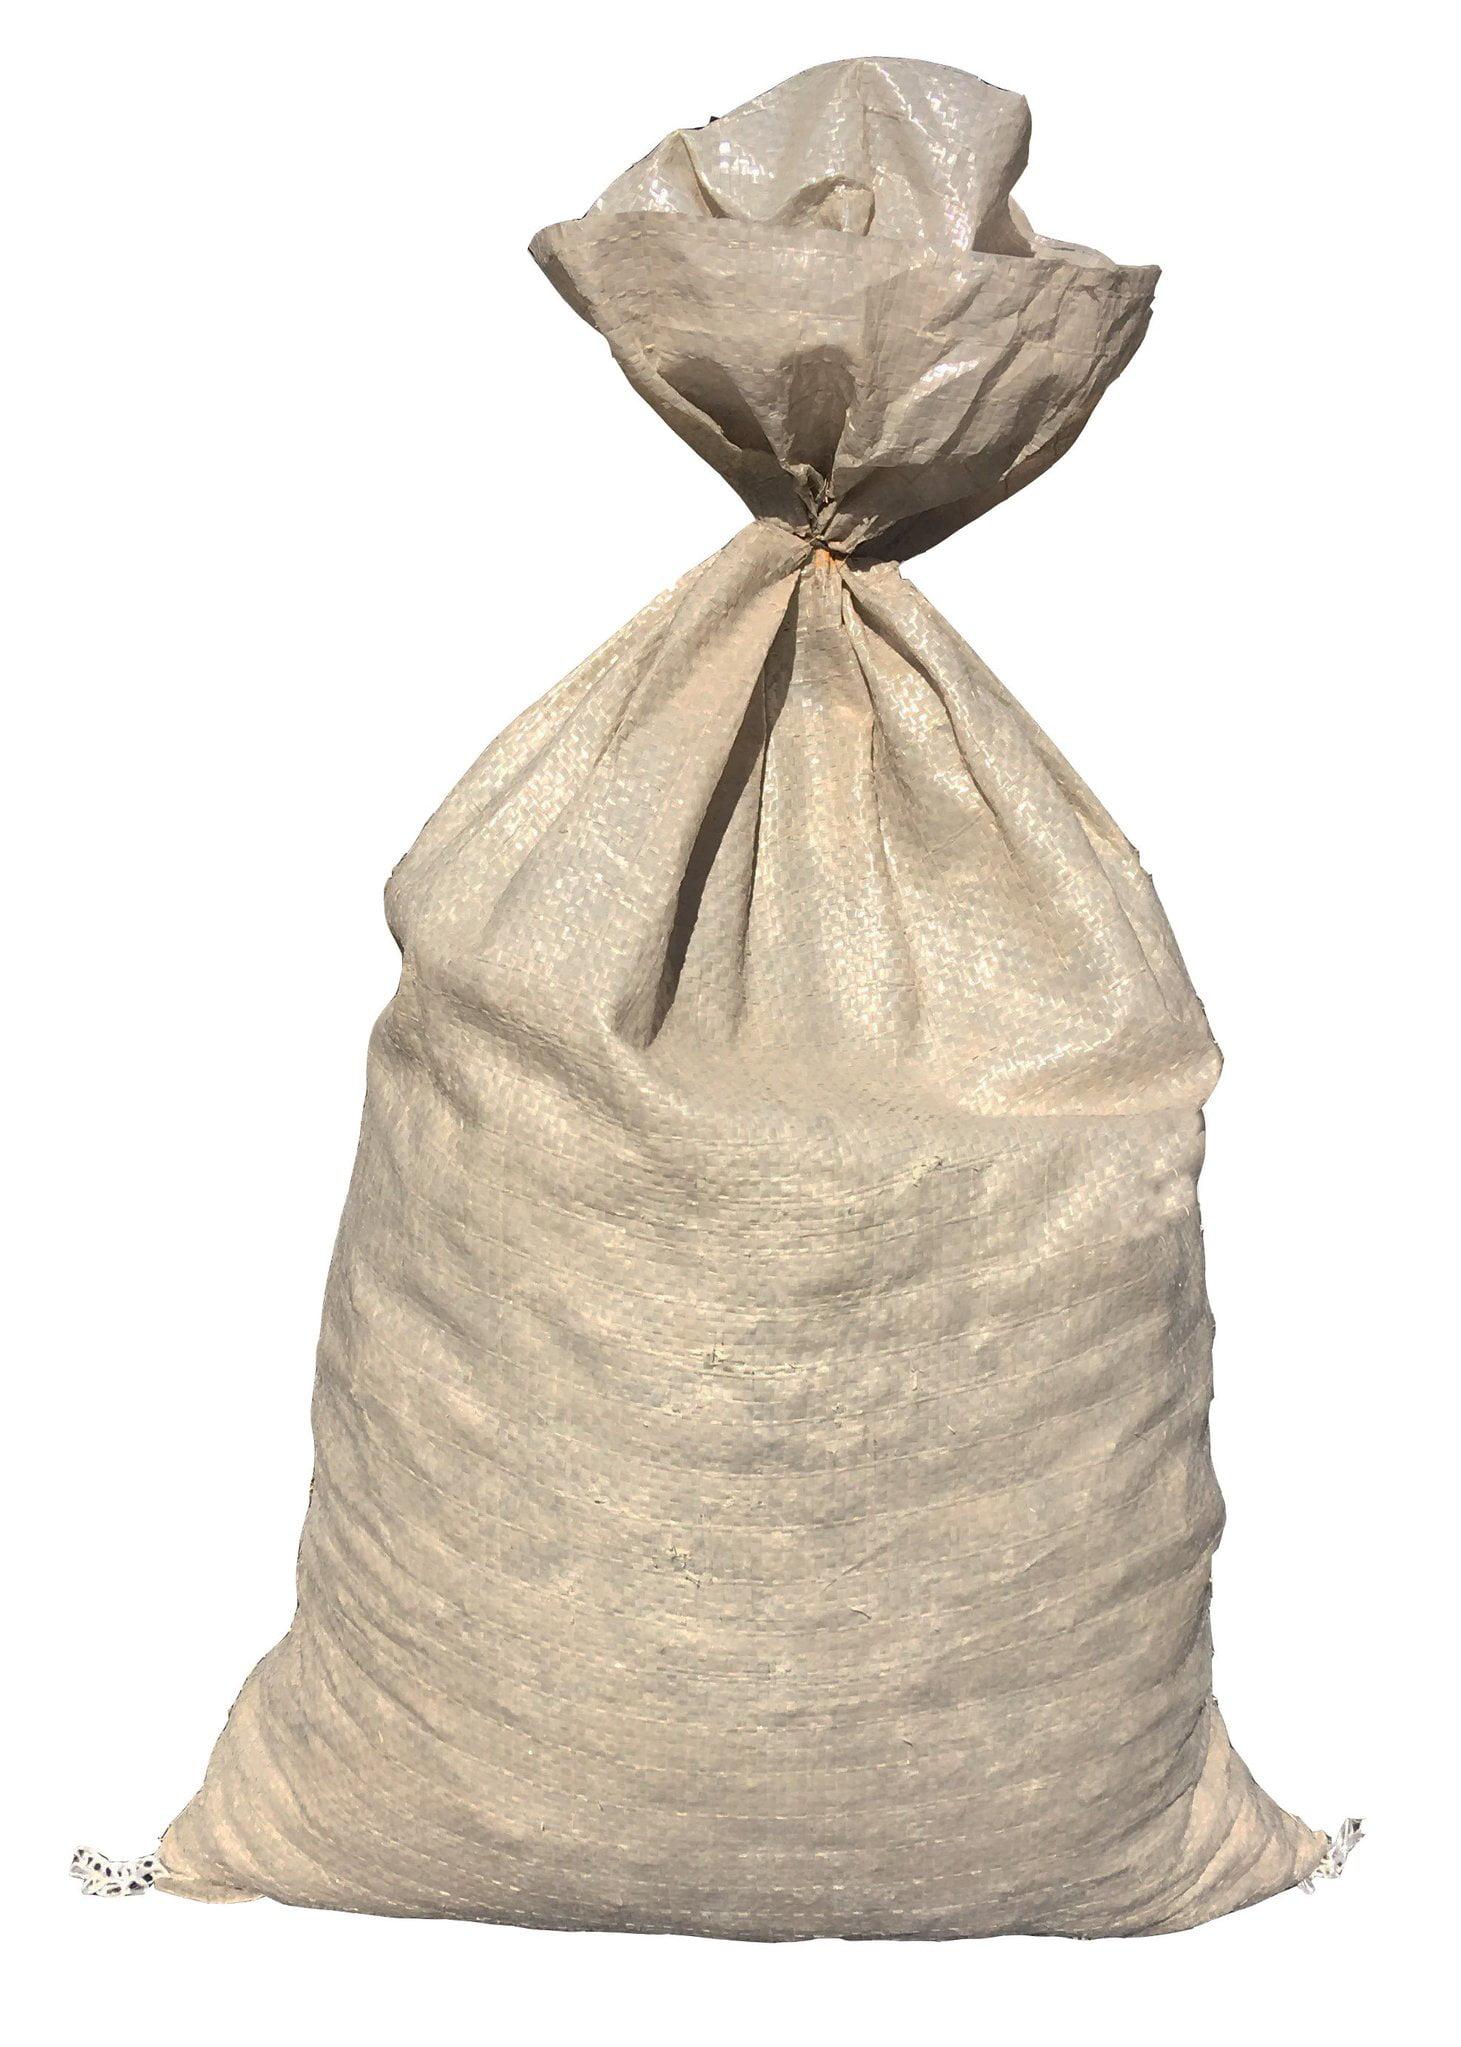 Sandbags For Flooding Size 14 X 26 Beige Empty Whole Bulk Sand Bag Flood Water Barrier Curb Tent